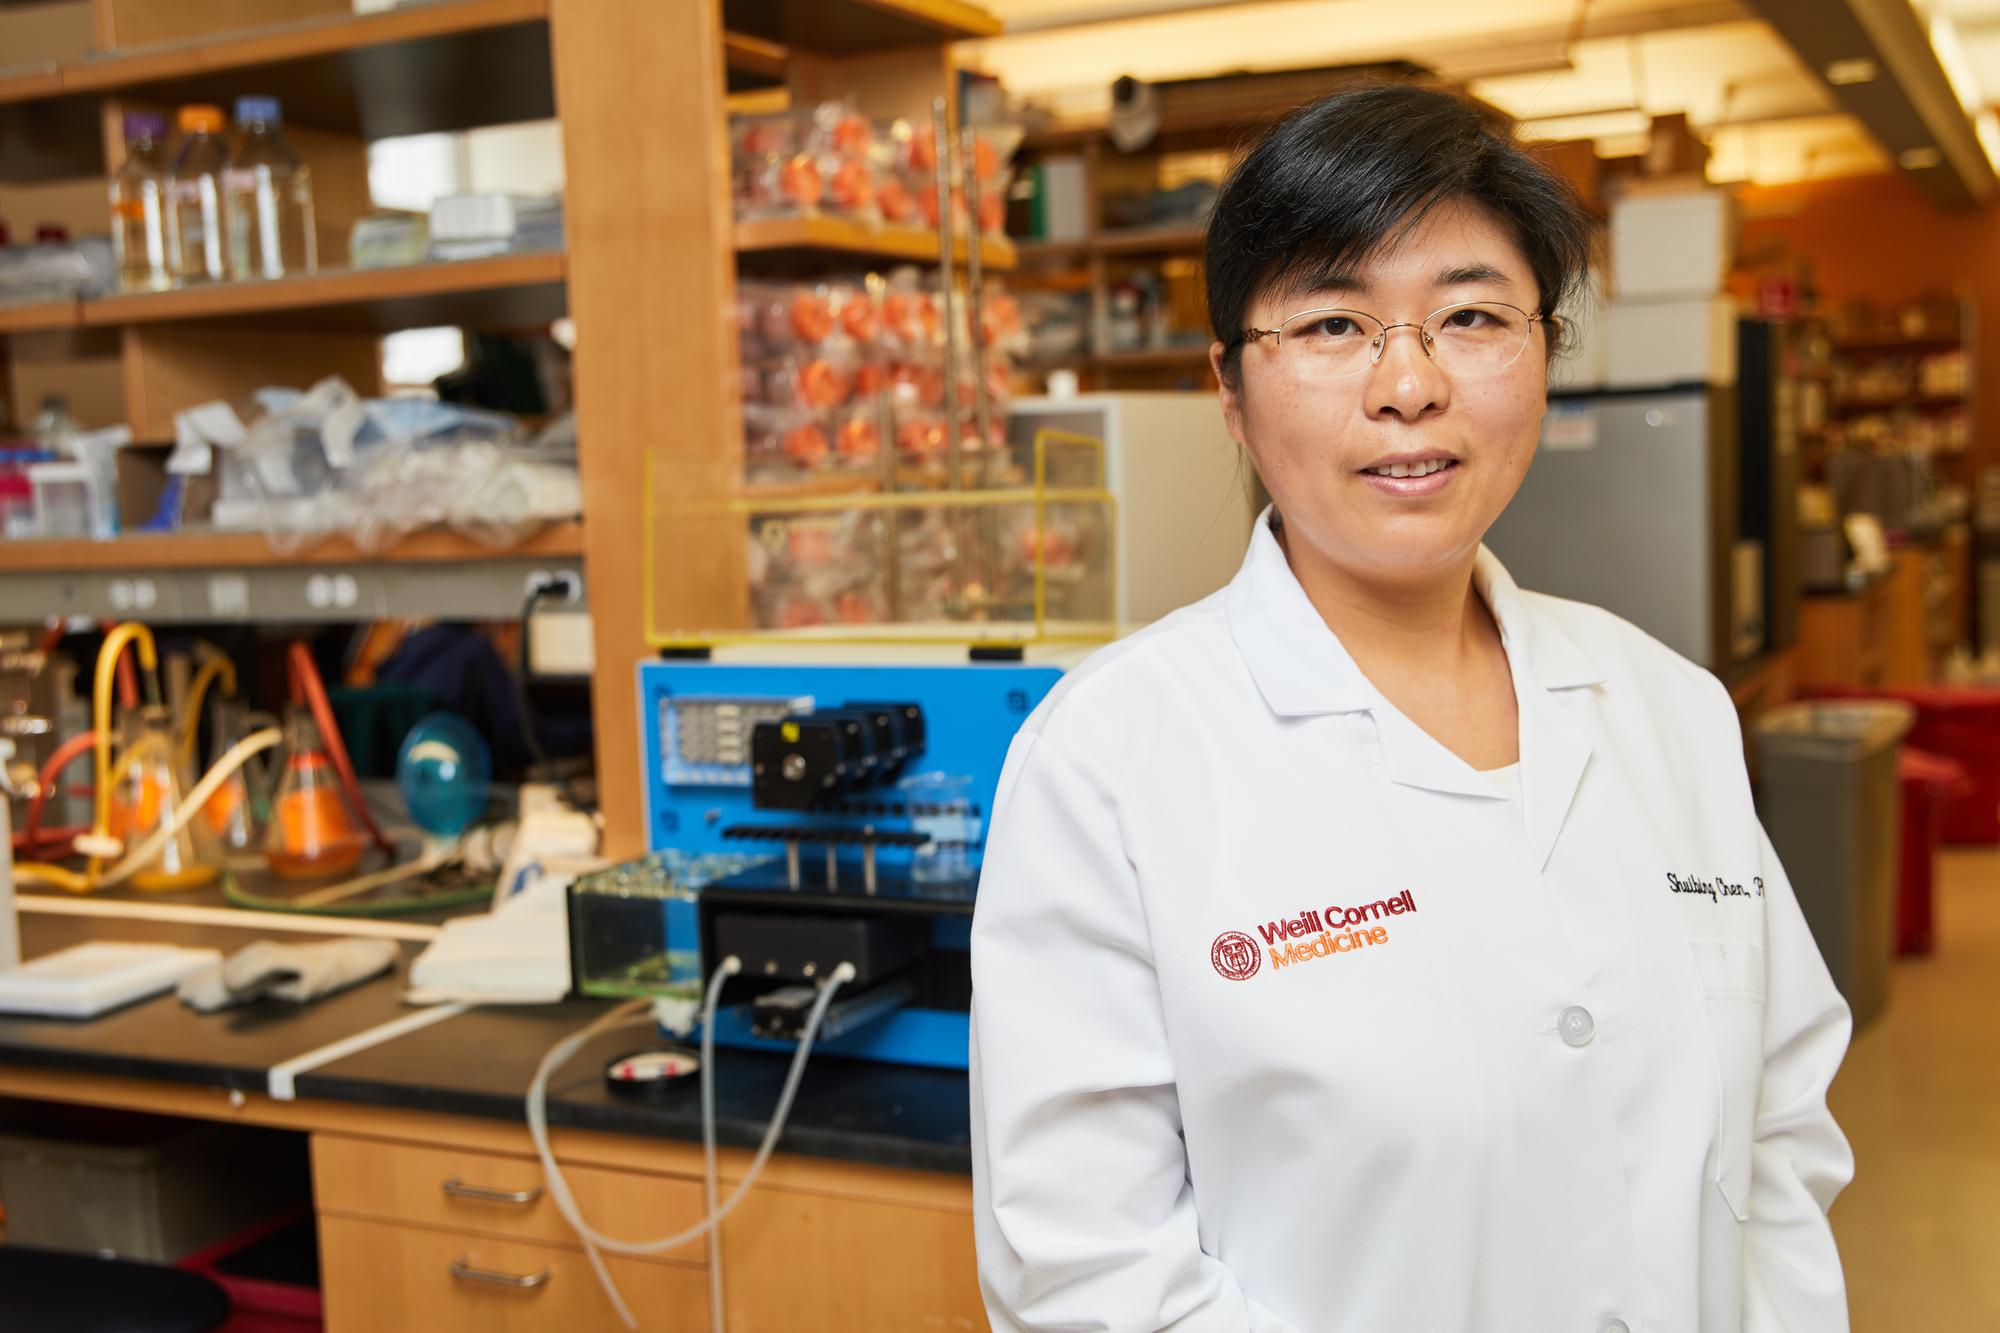 Dr. Shuibing Chen